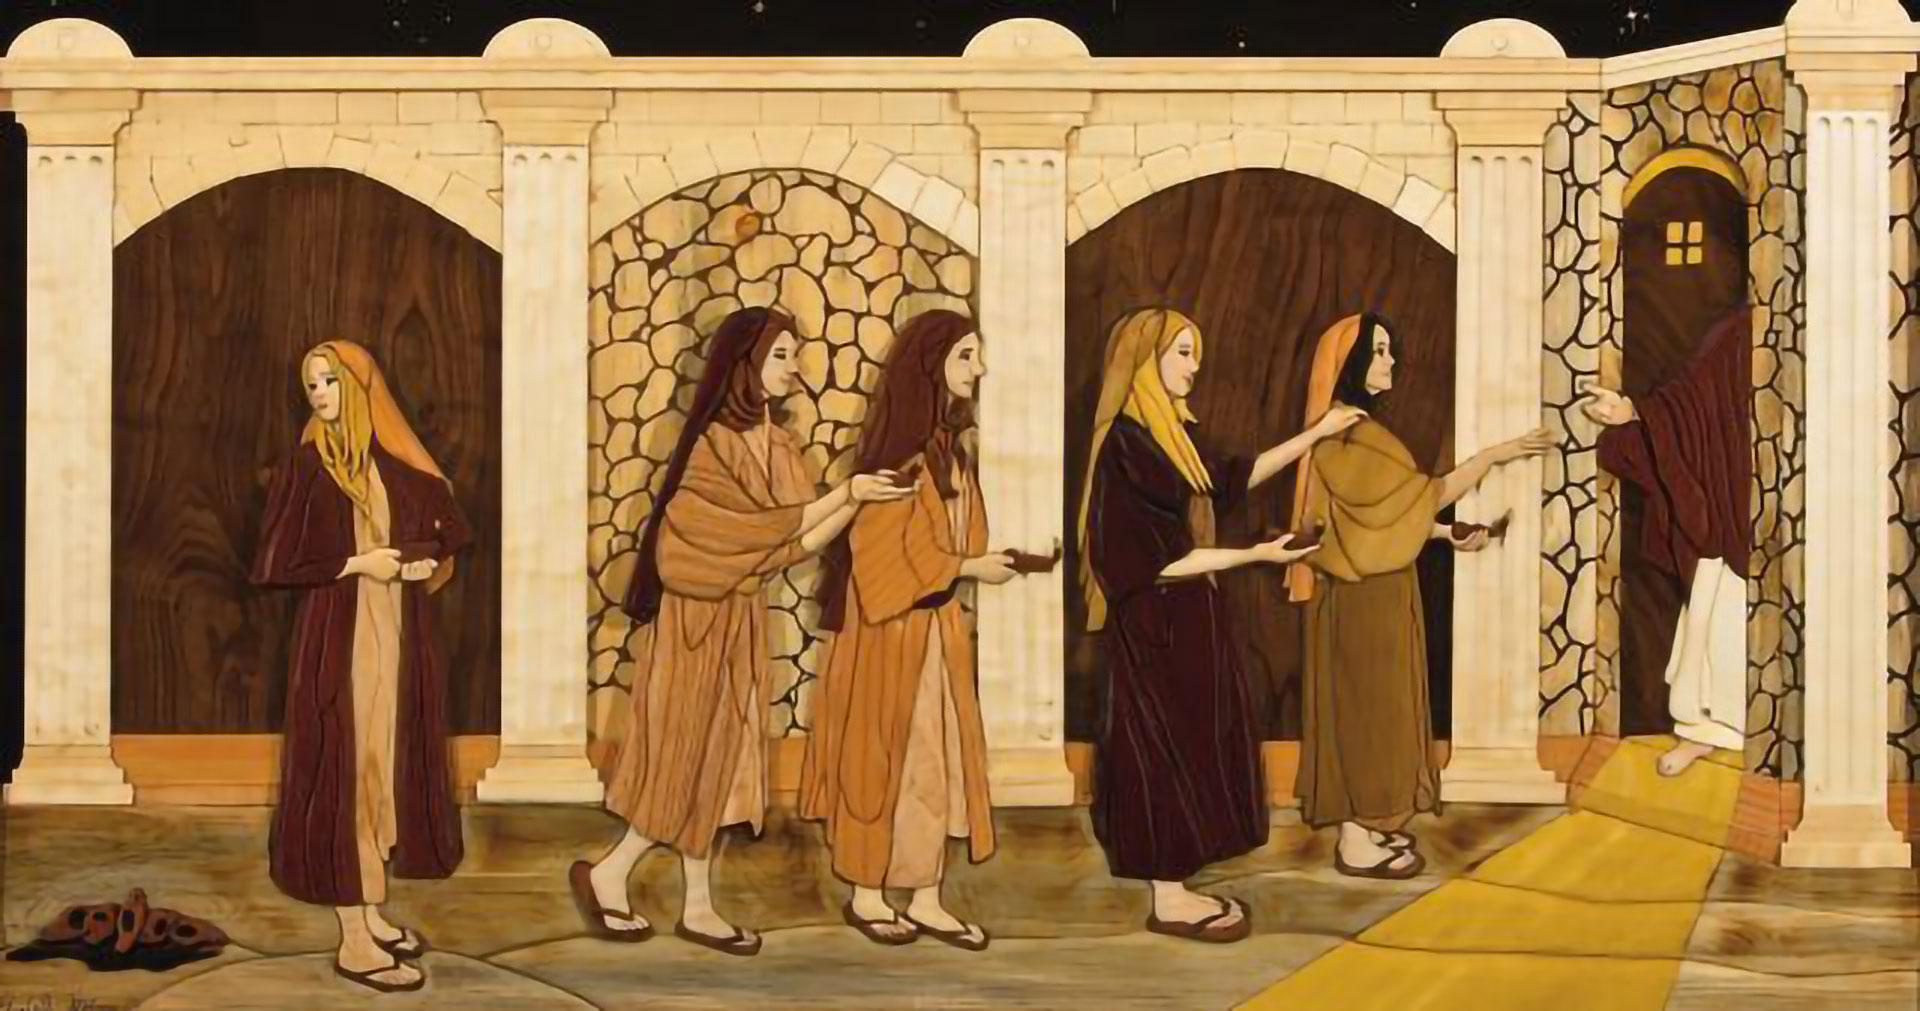 The Bridegroom Cometh, by Elizabeth Gibbons. Image via Church of Jesus Christ.